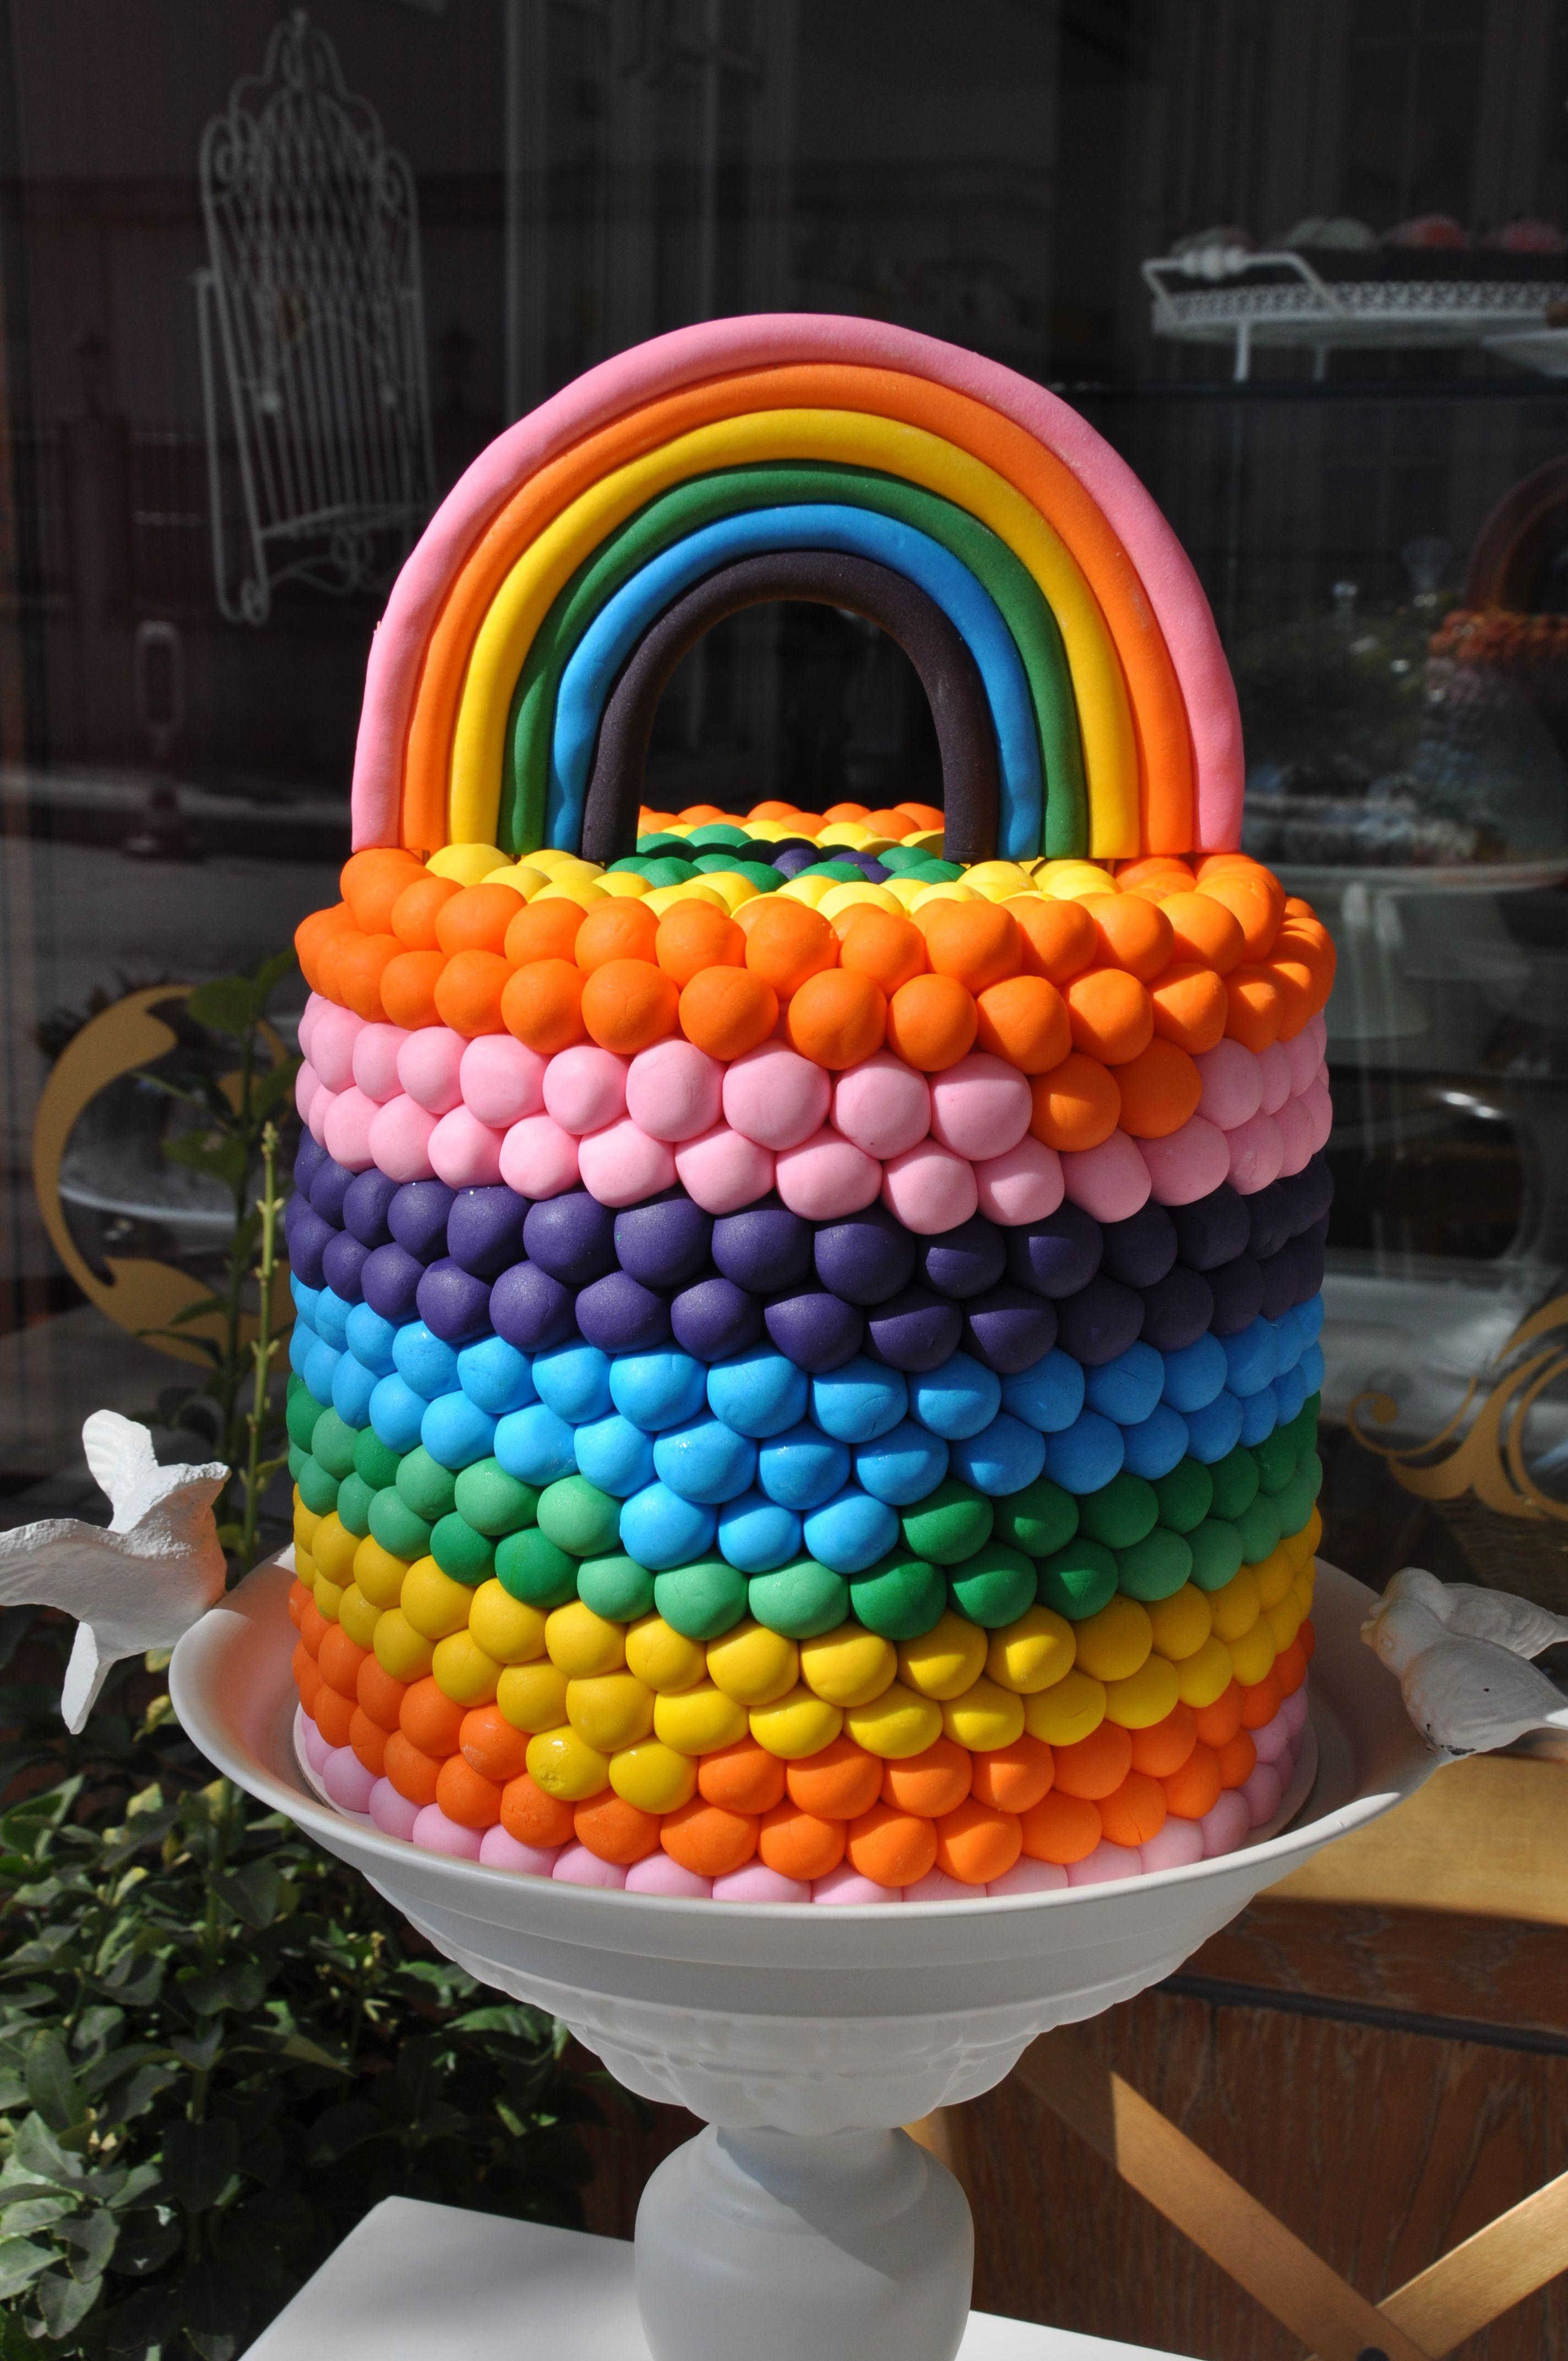 Rainbow Cake Ideas. İnstagram: happycaking